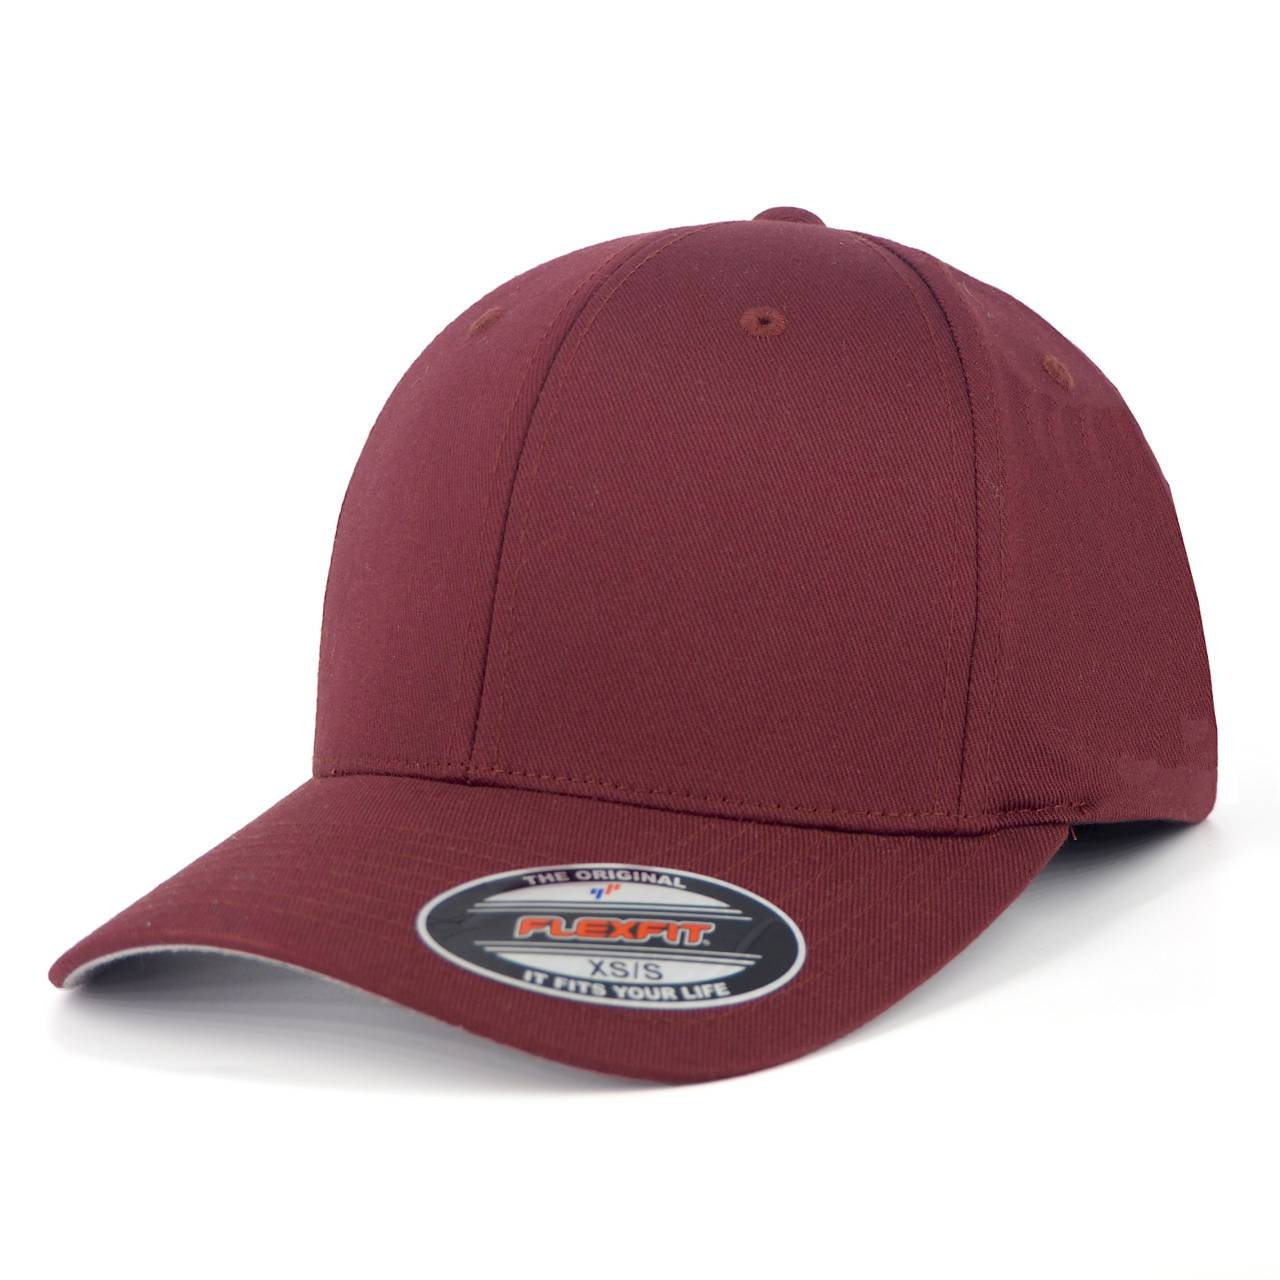 6277-00150-00 FLEXFIT WOOLY COMBED MAROON BLANK CAP